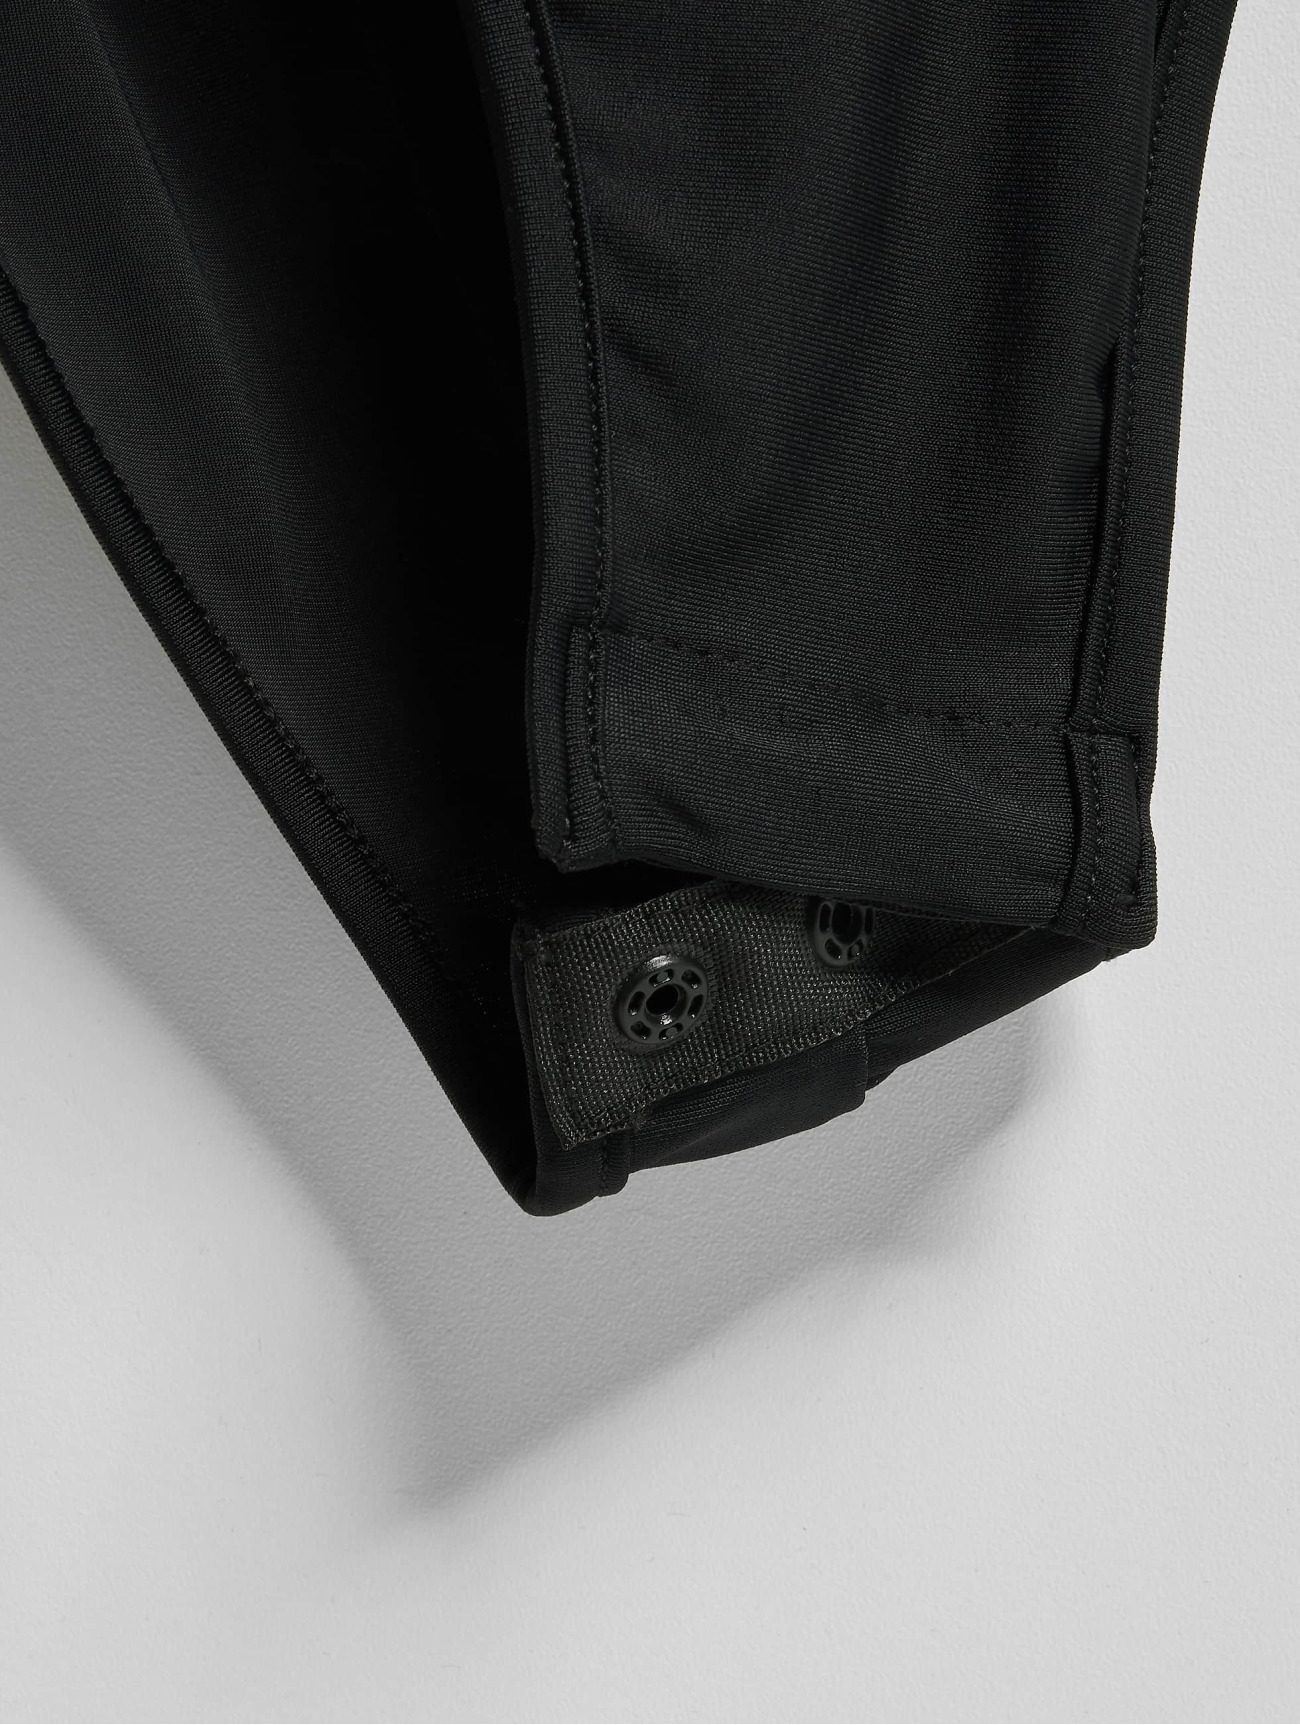 Sixth June Overwear / Body Waist Buckle in black 723654